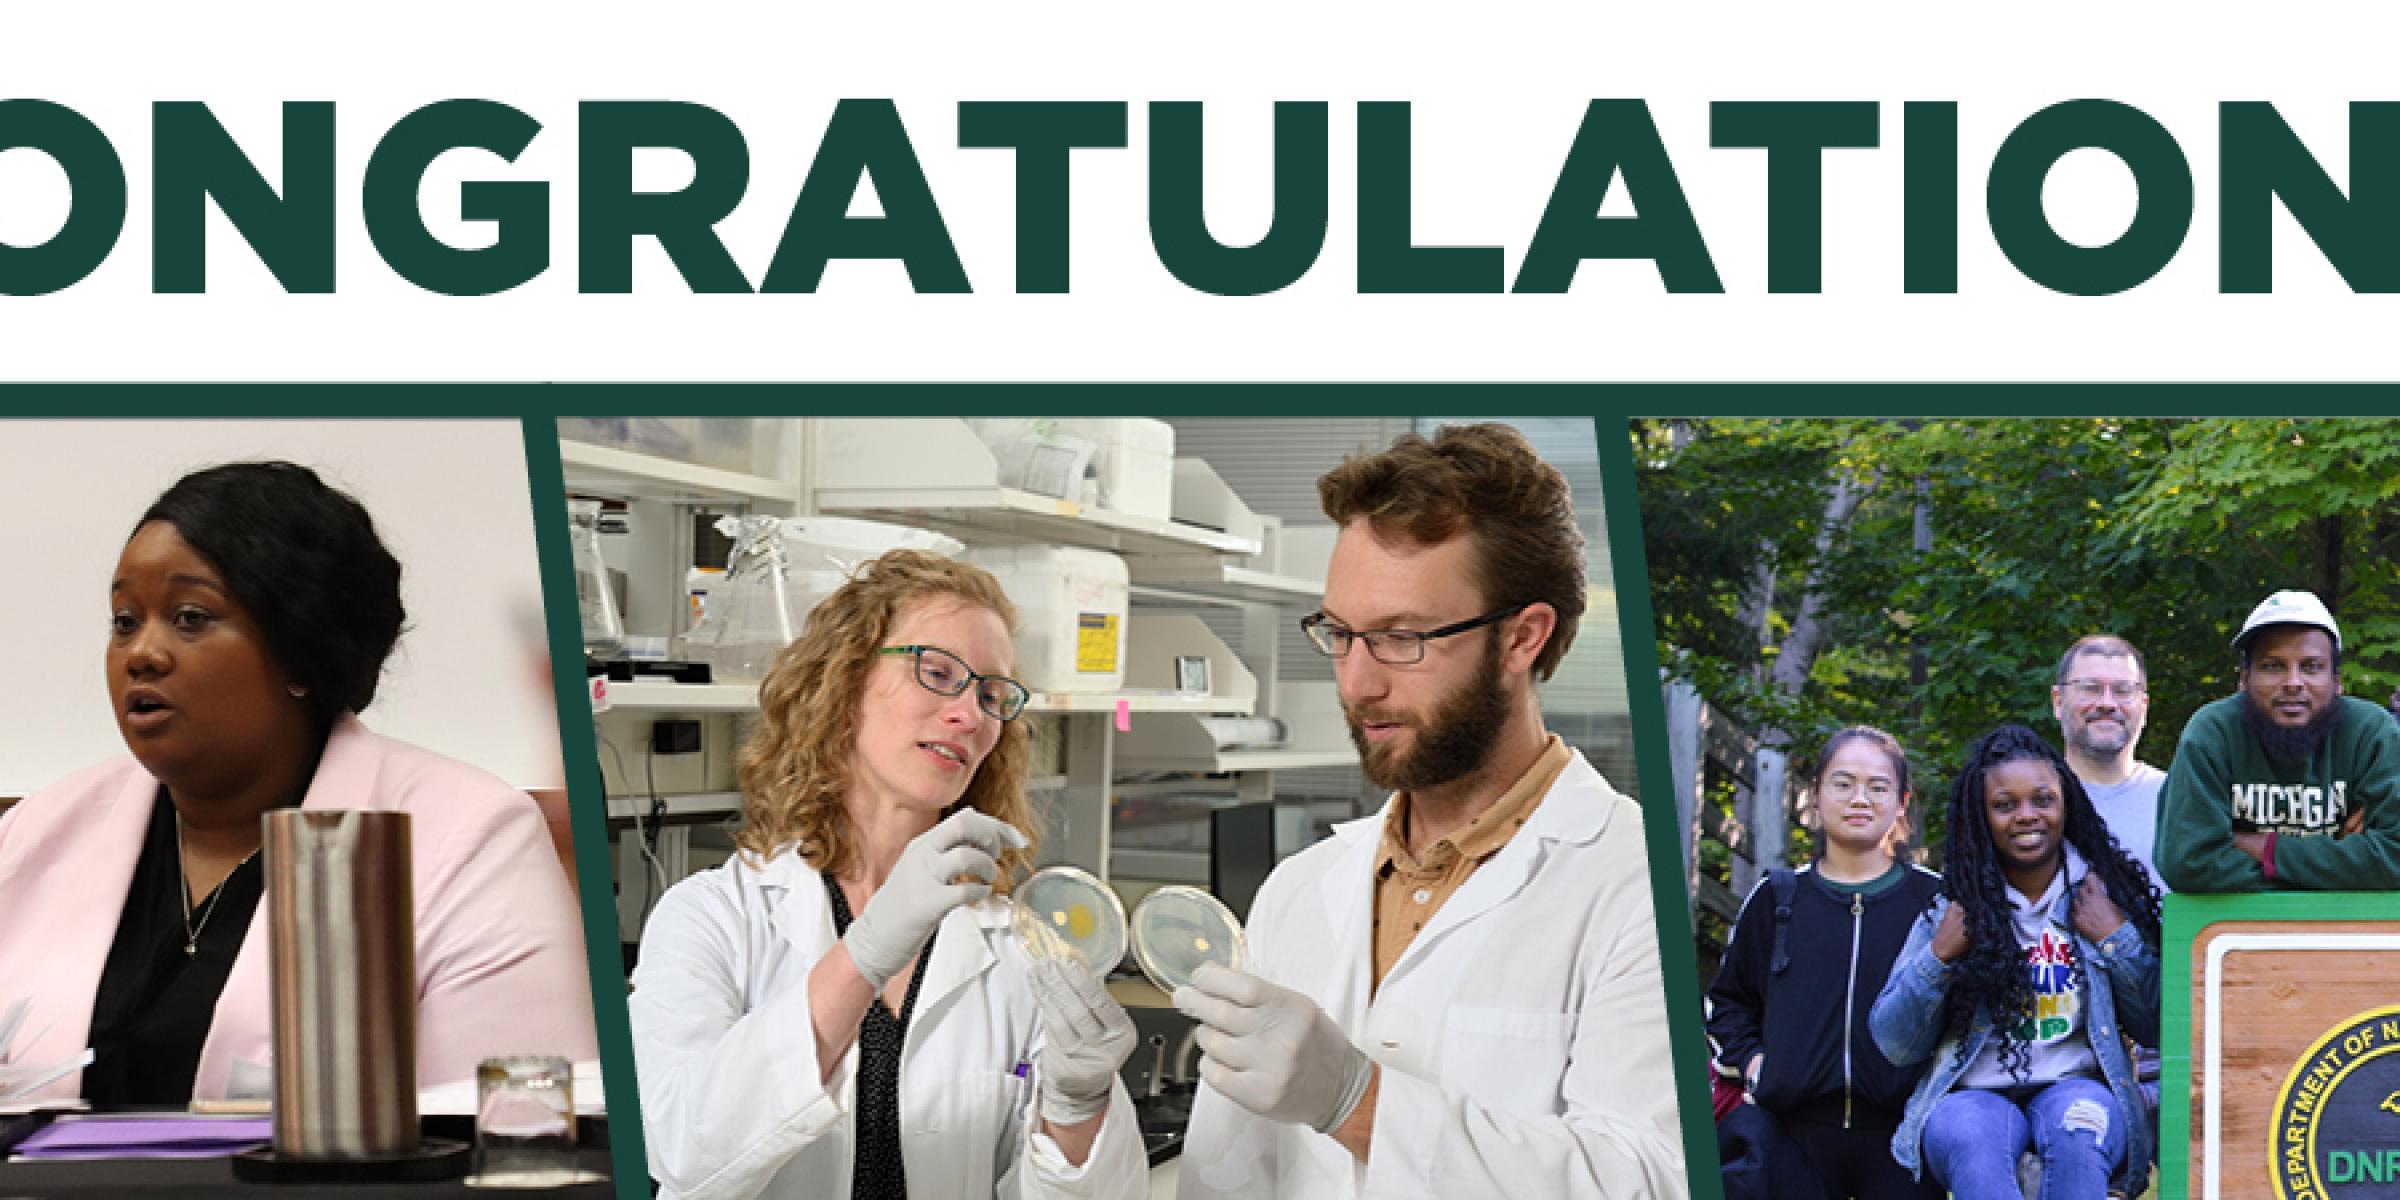 Congratulations to our Mentoring Awards Recipients